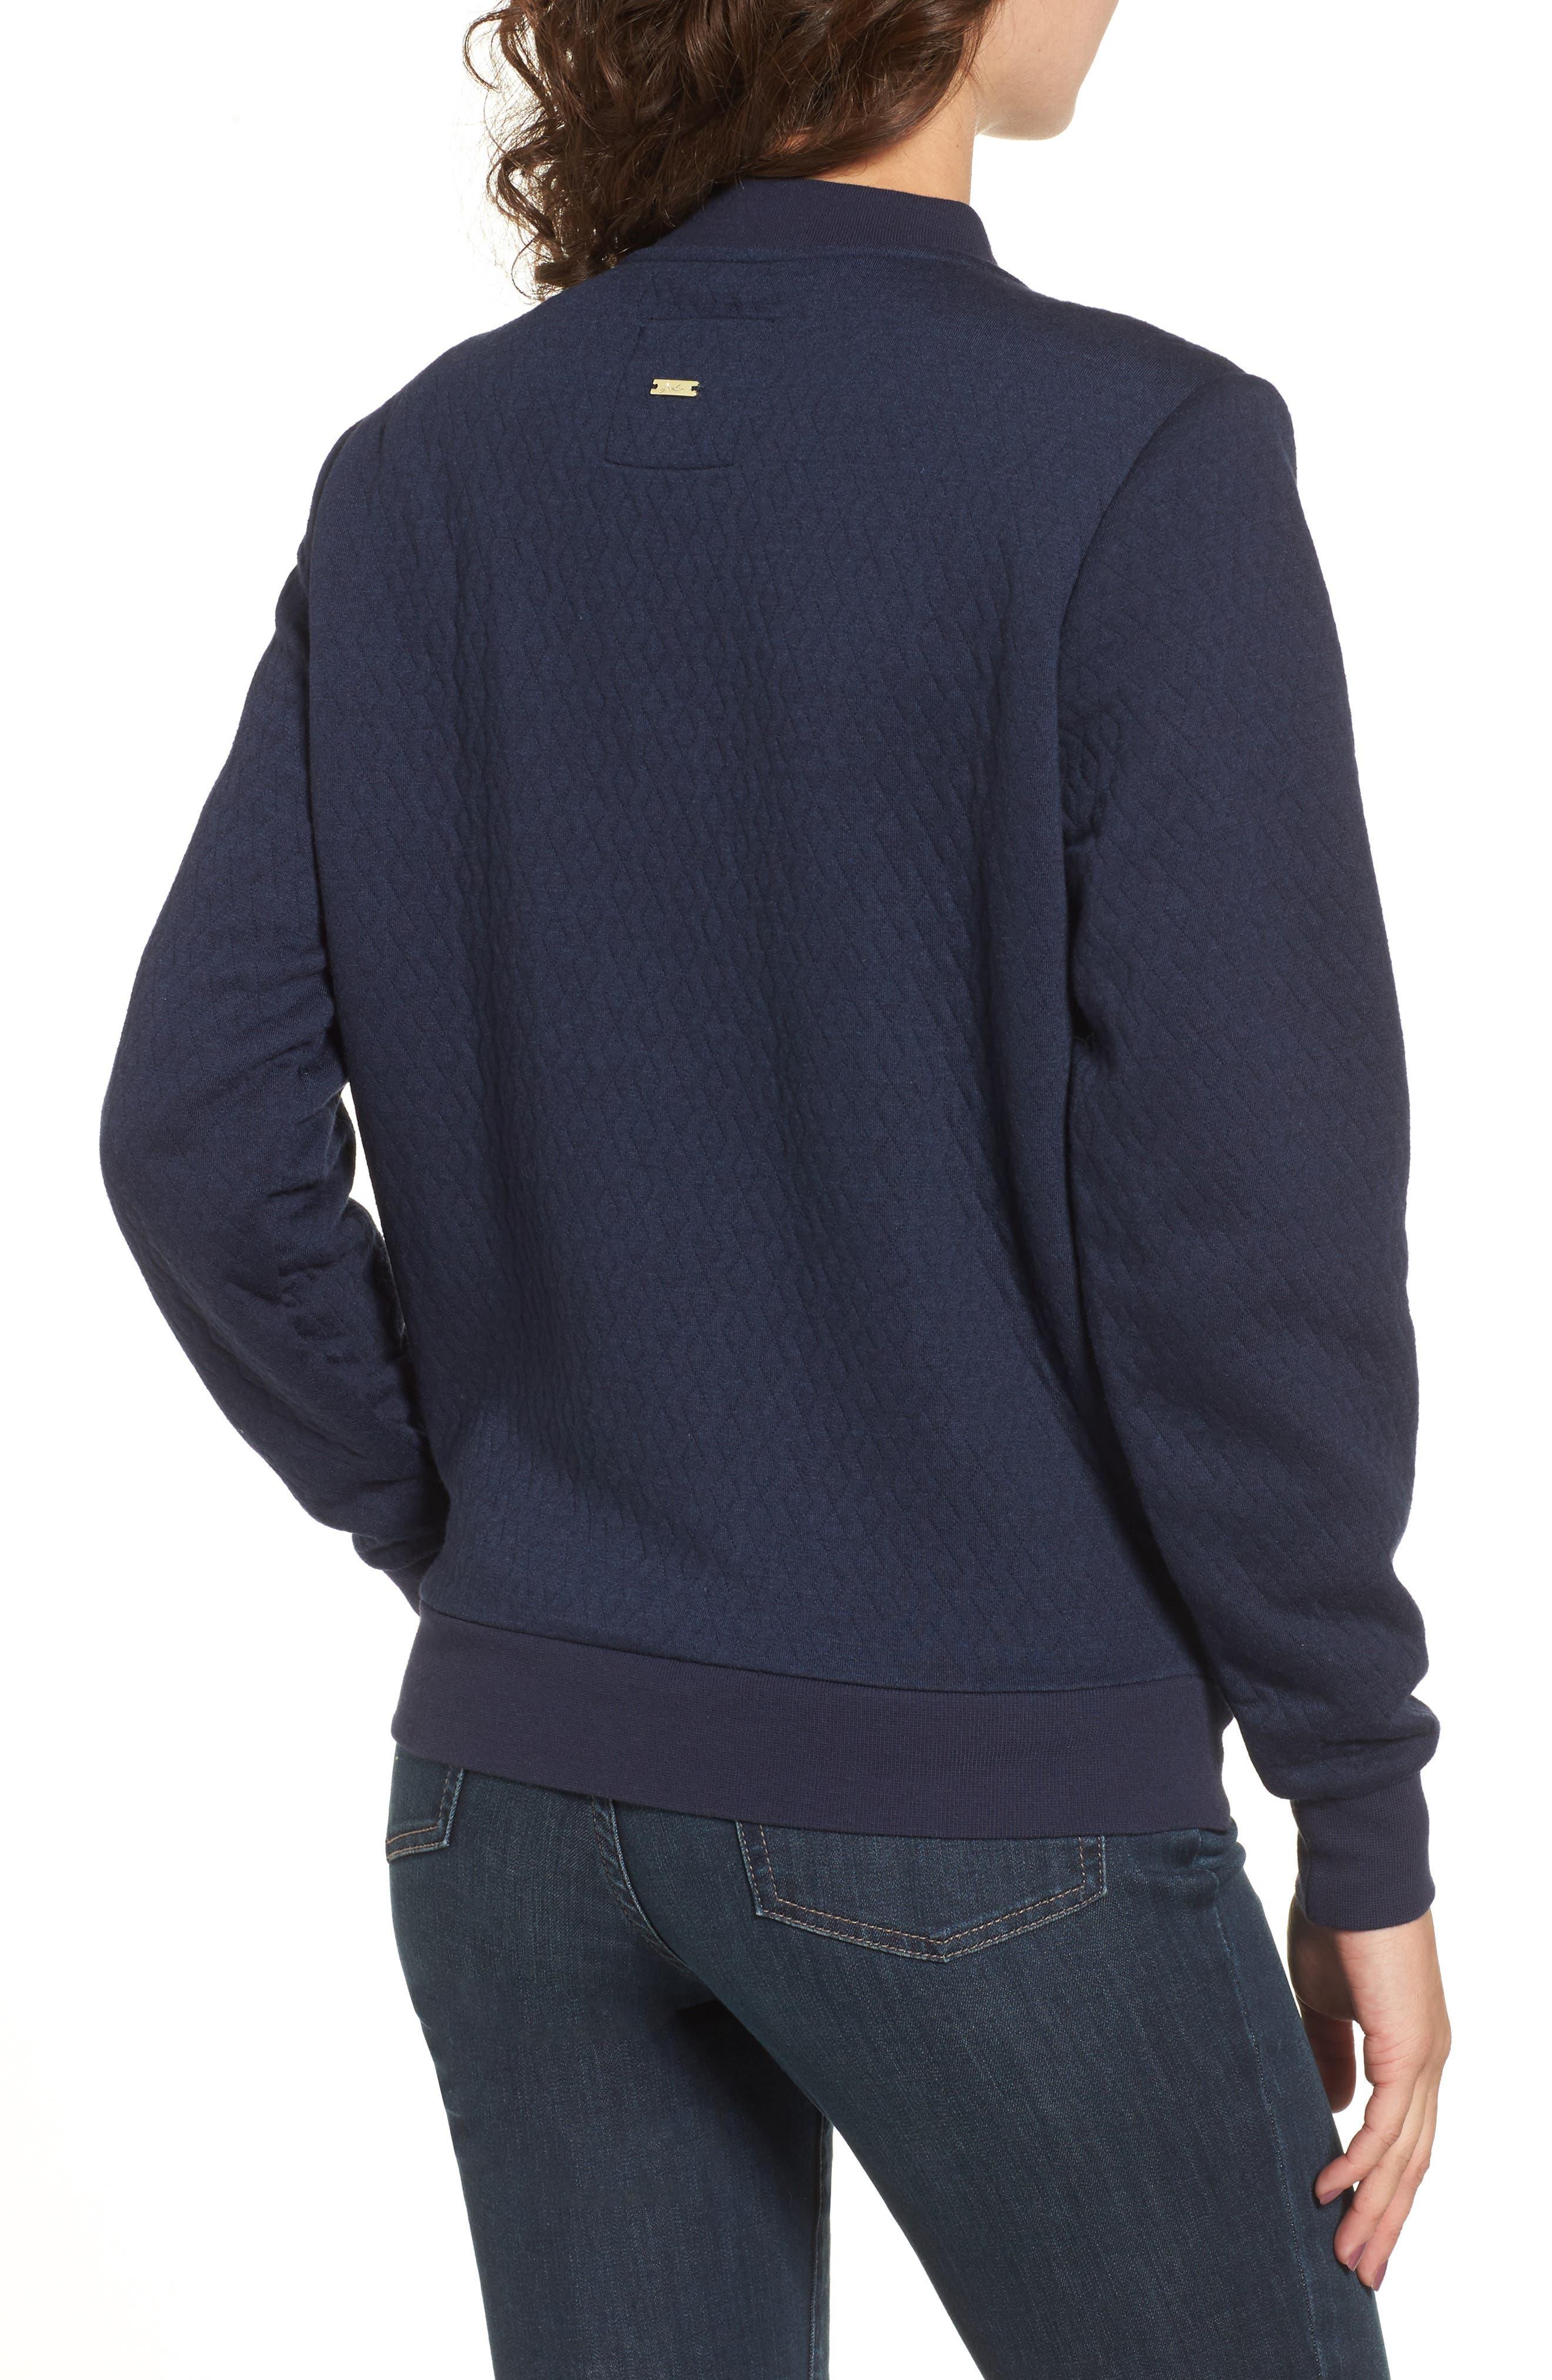 Alternate Image 2  - Joules Millie Bomber Sweatshirt Jacket